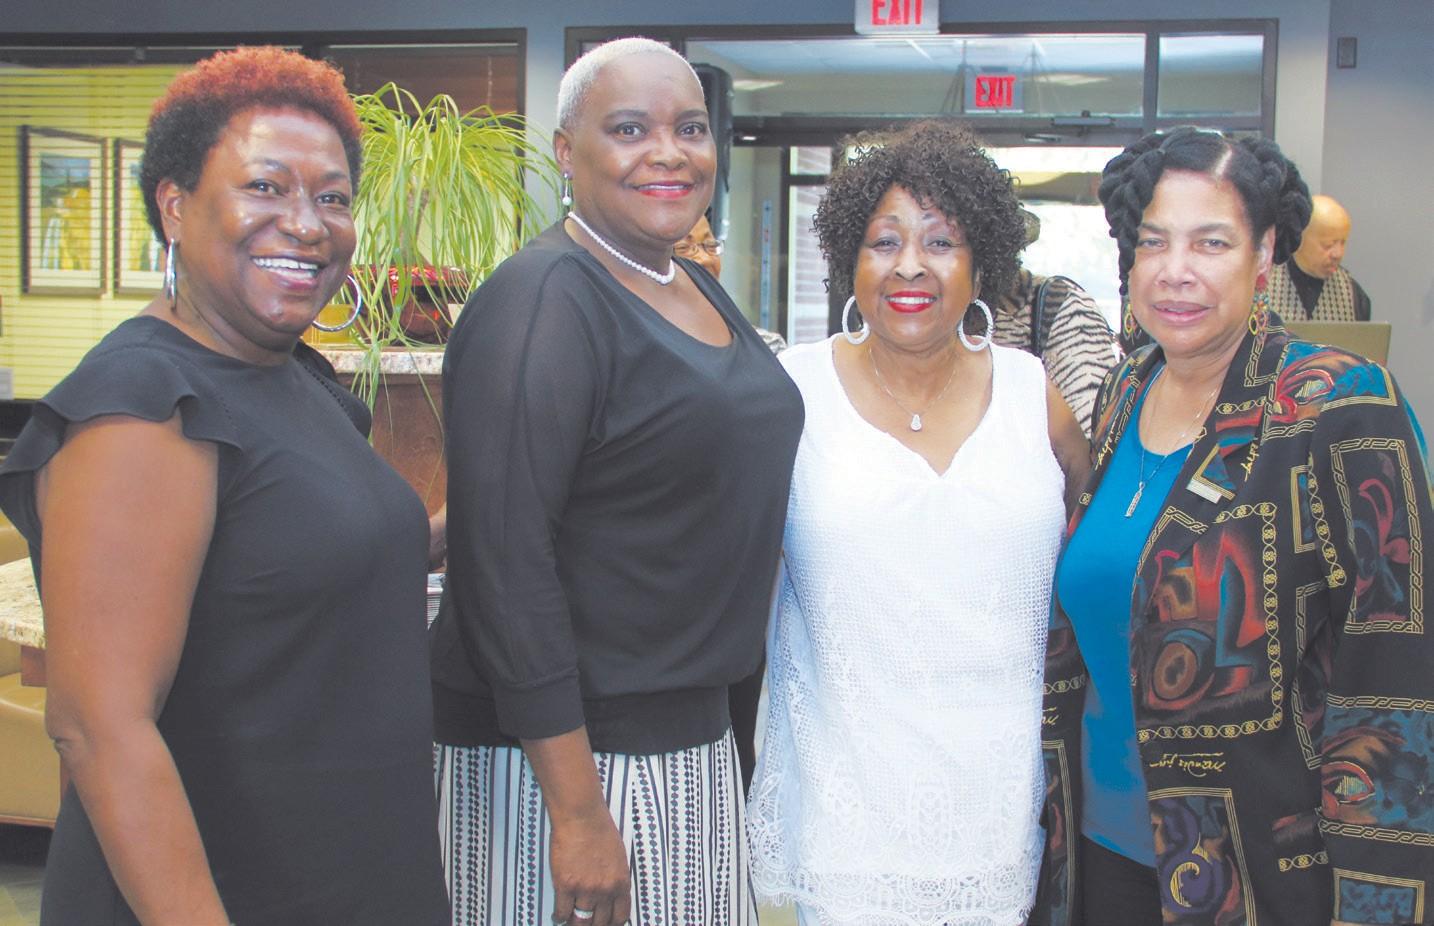 L-R: Tribune General Manager Tanya Milton, Dr. Deborah Cole, Former Savannah Mayor Edna Jackson, and Dr. Jacqualyn F. Green.